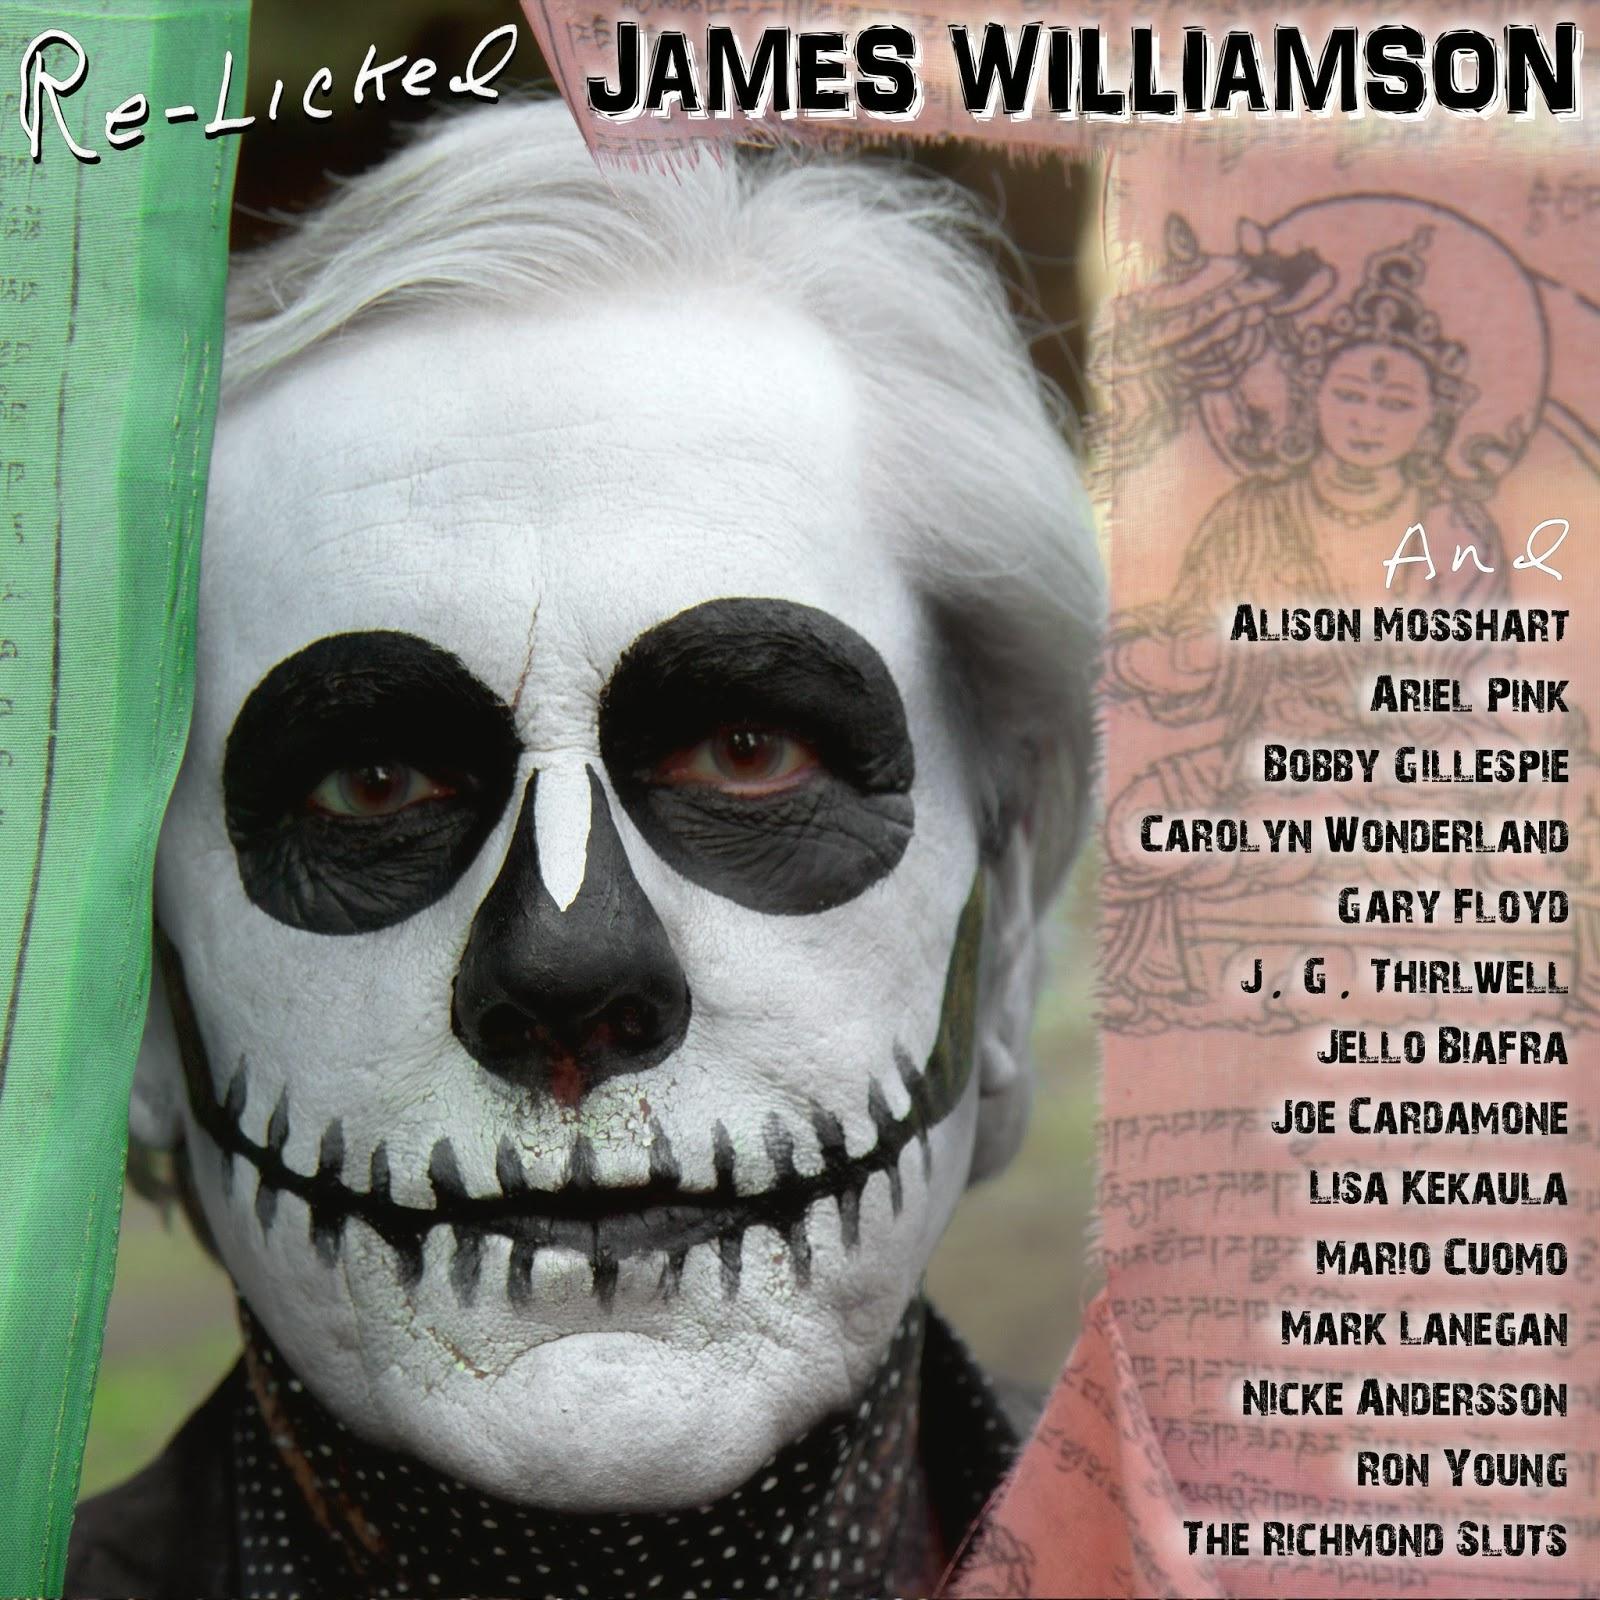 James Williamson - The Woman I Love